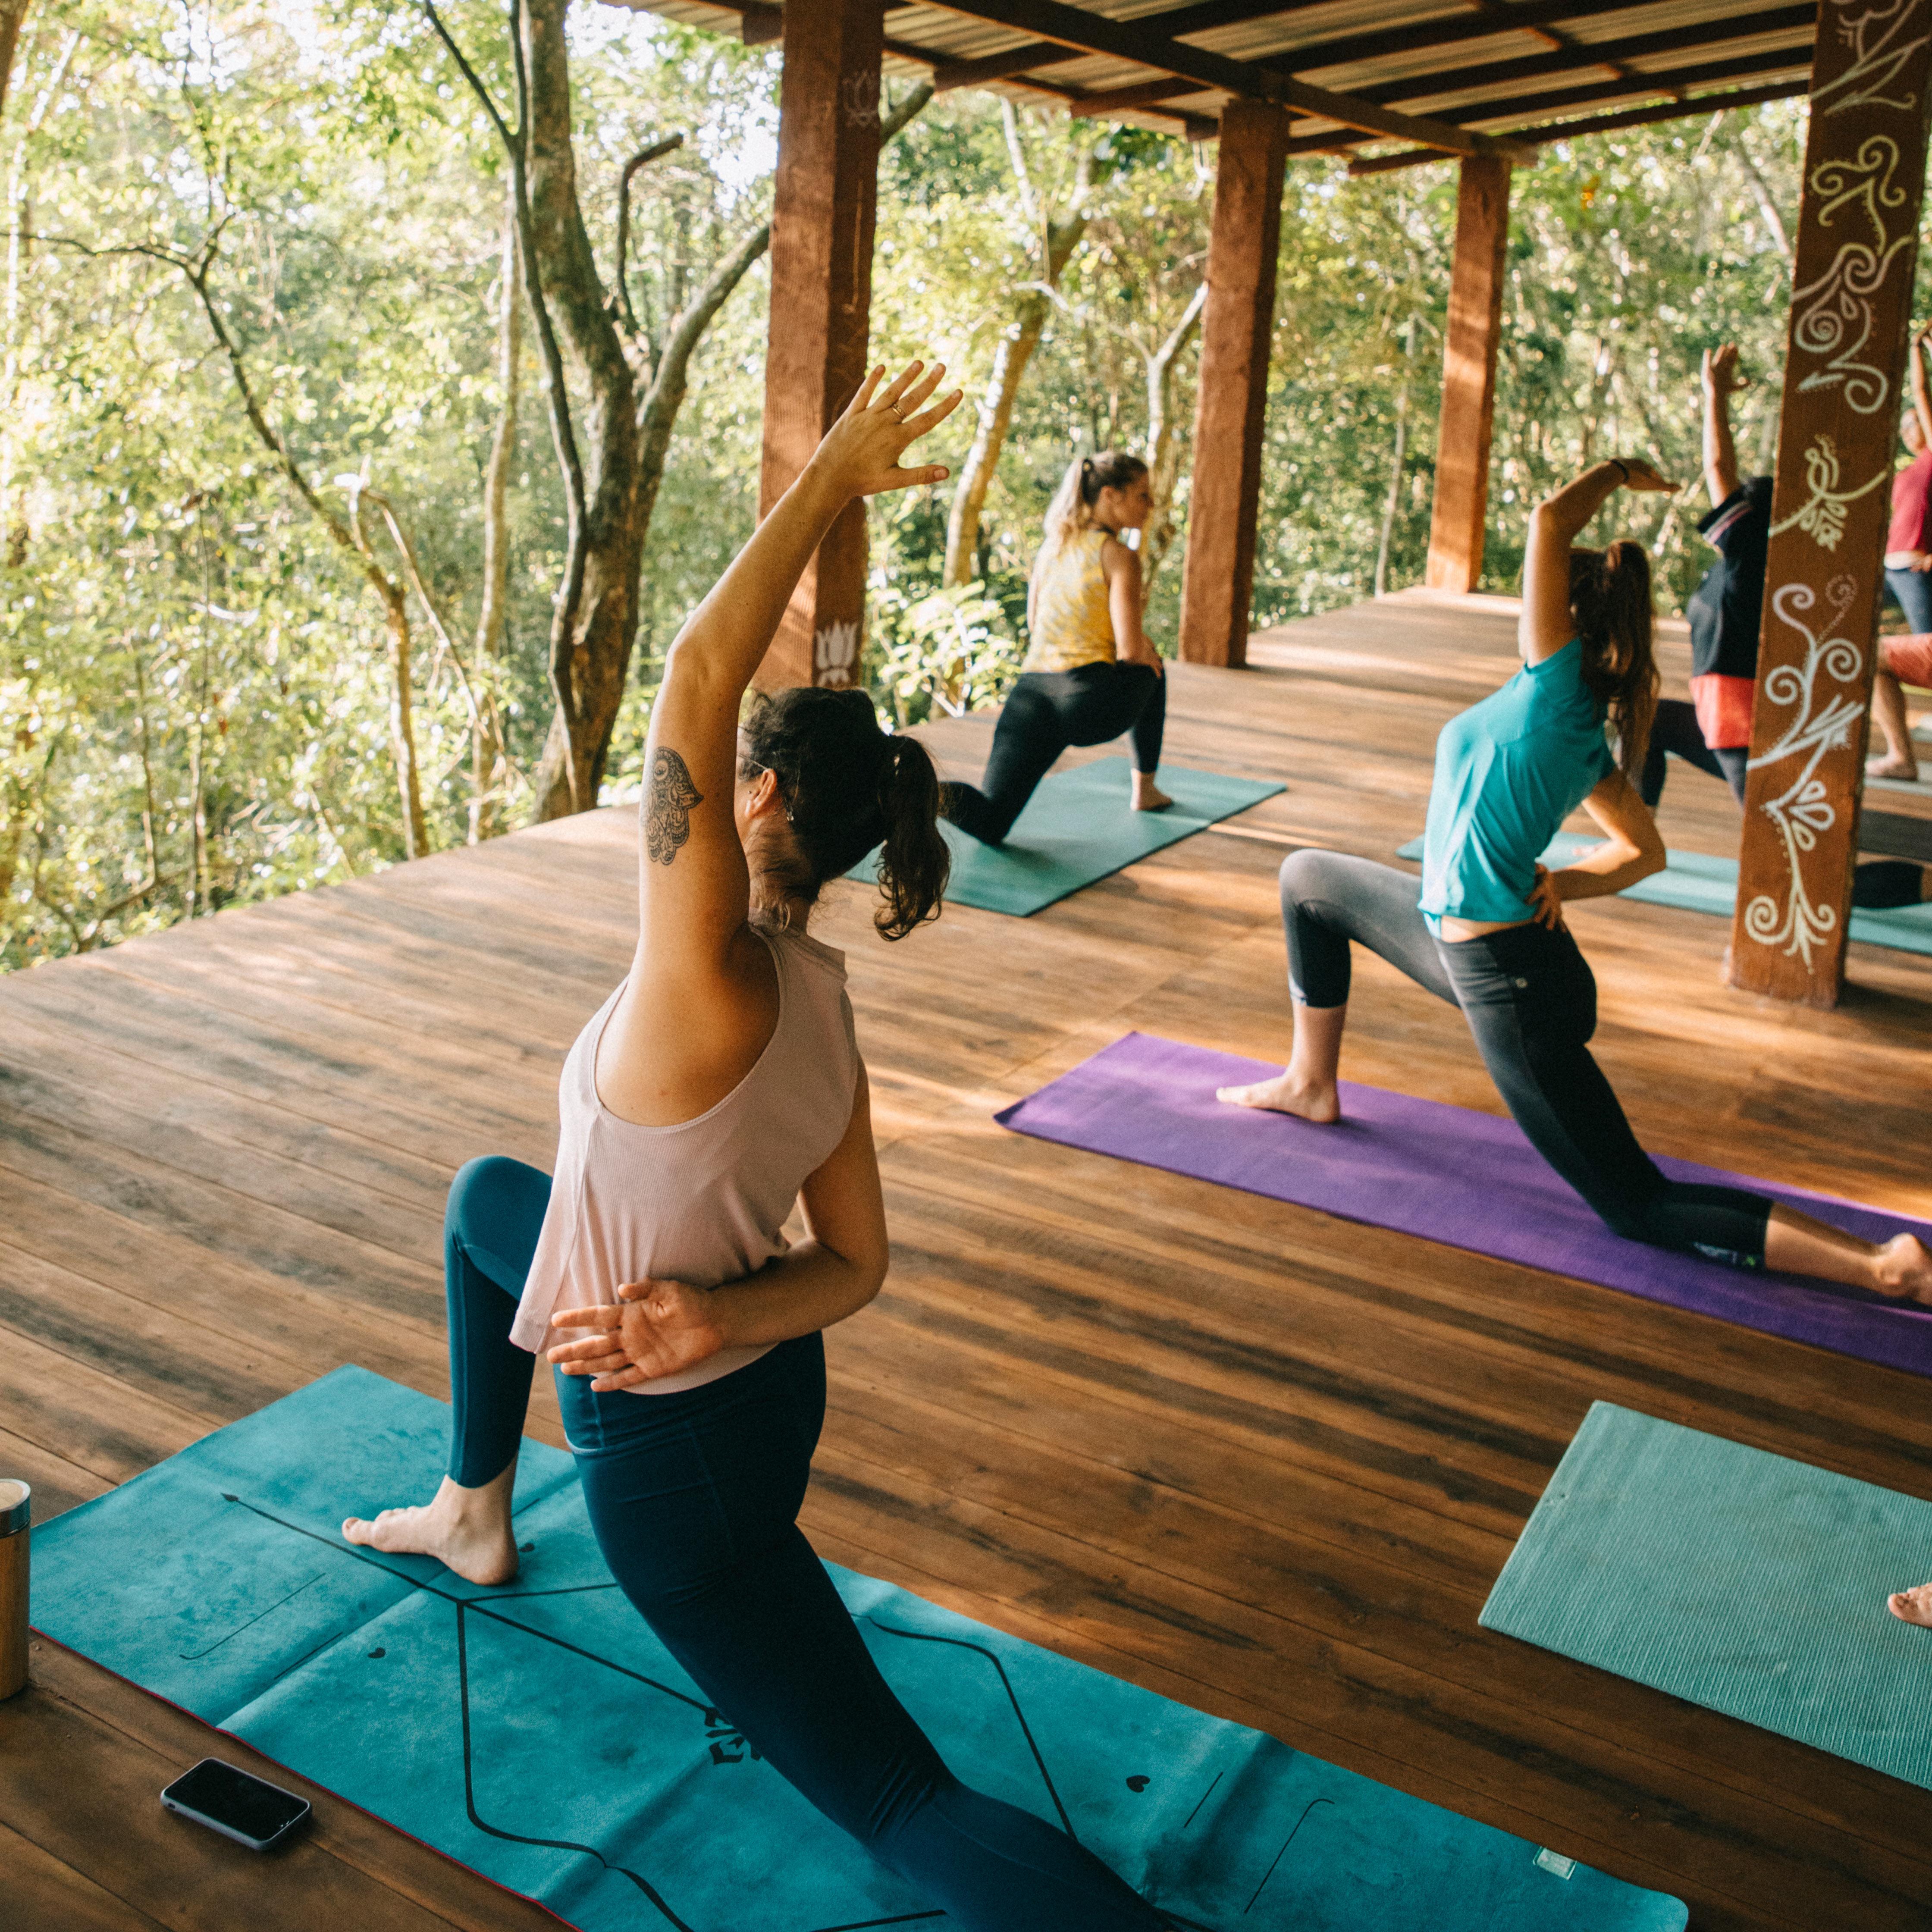 Sri Lanka, Nuwara Eliya, Yoga @Clara Ferrand